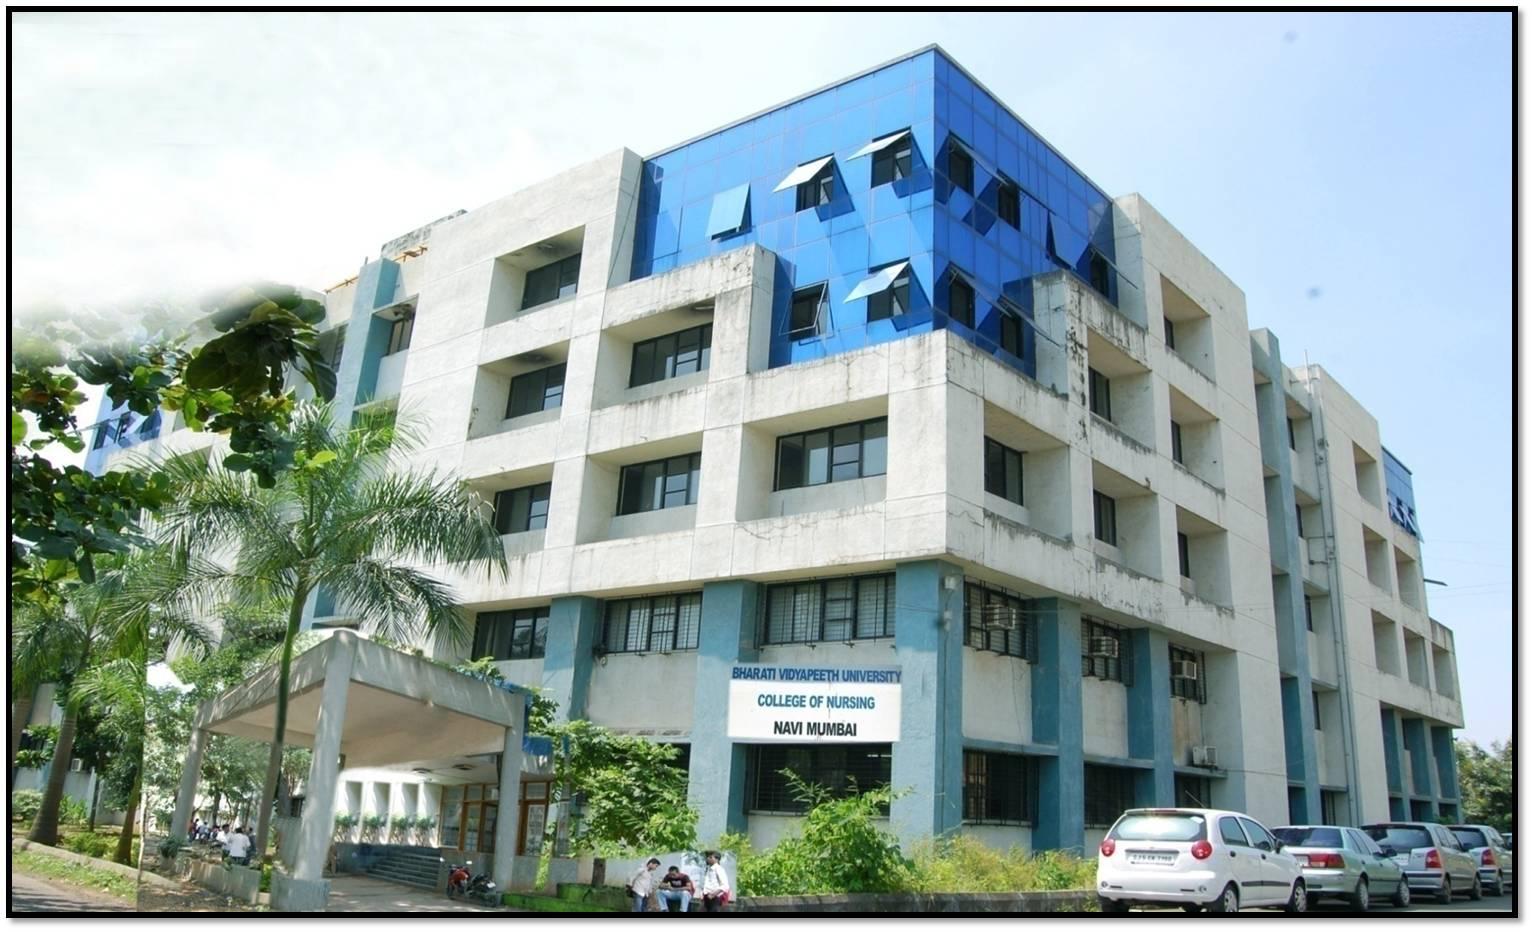 Bharati Vidyapeeth (Deemed to be University) College of Nursing, Navi Mumbai